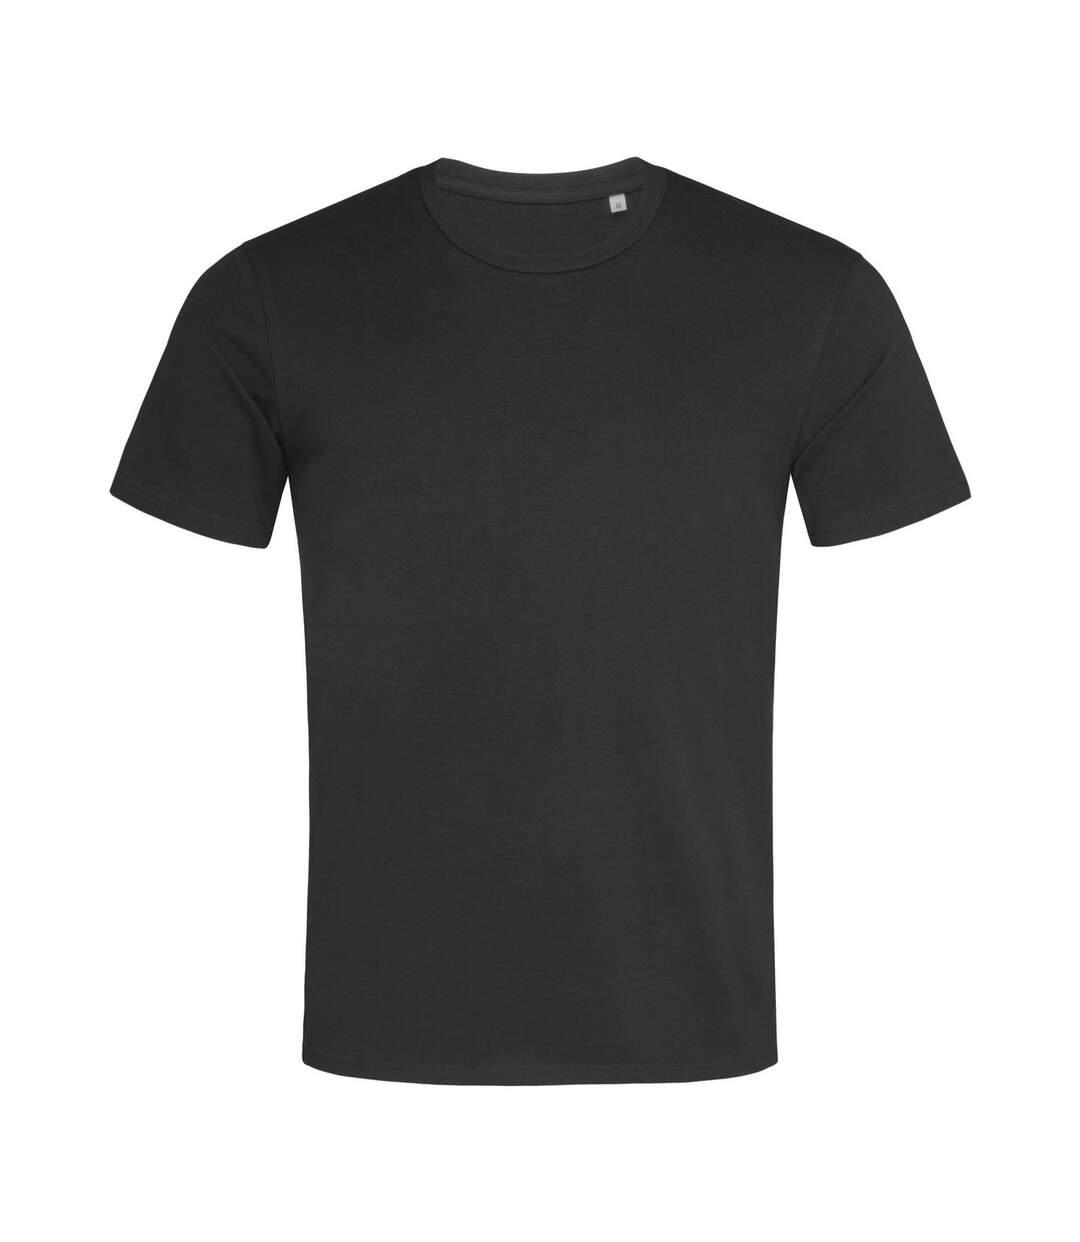 Stedman Mens Stars T-Shirt (Black Opal) - UTAB468